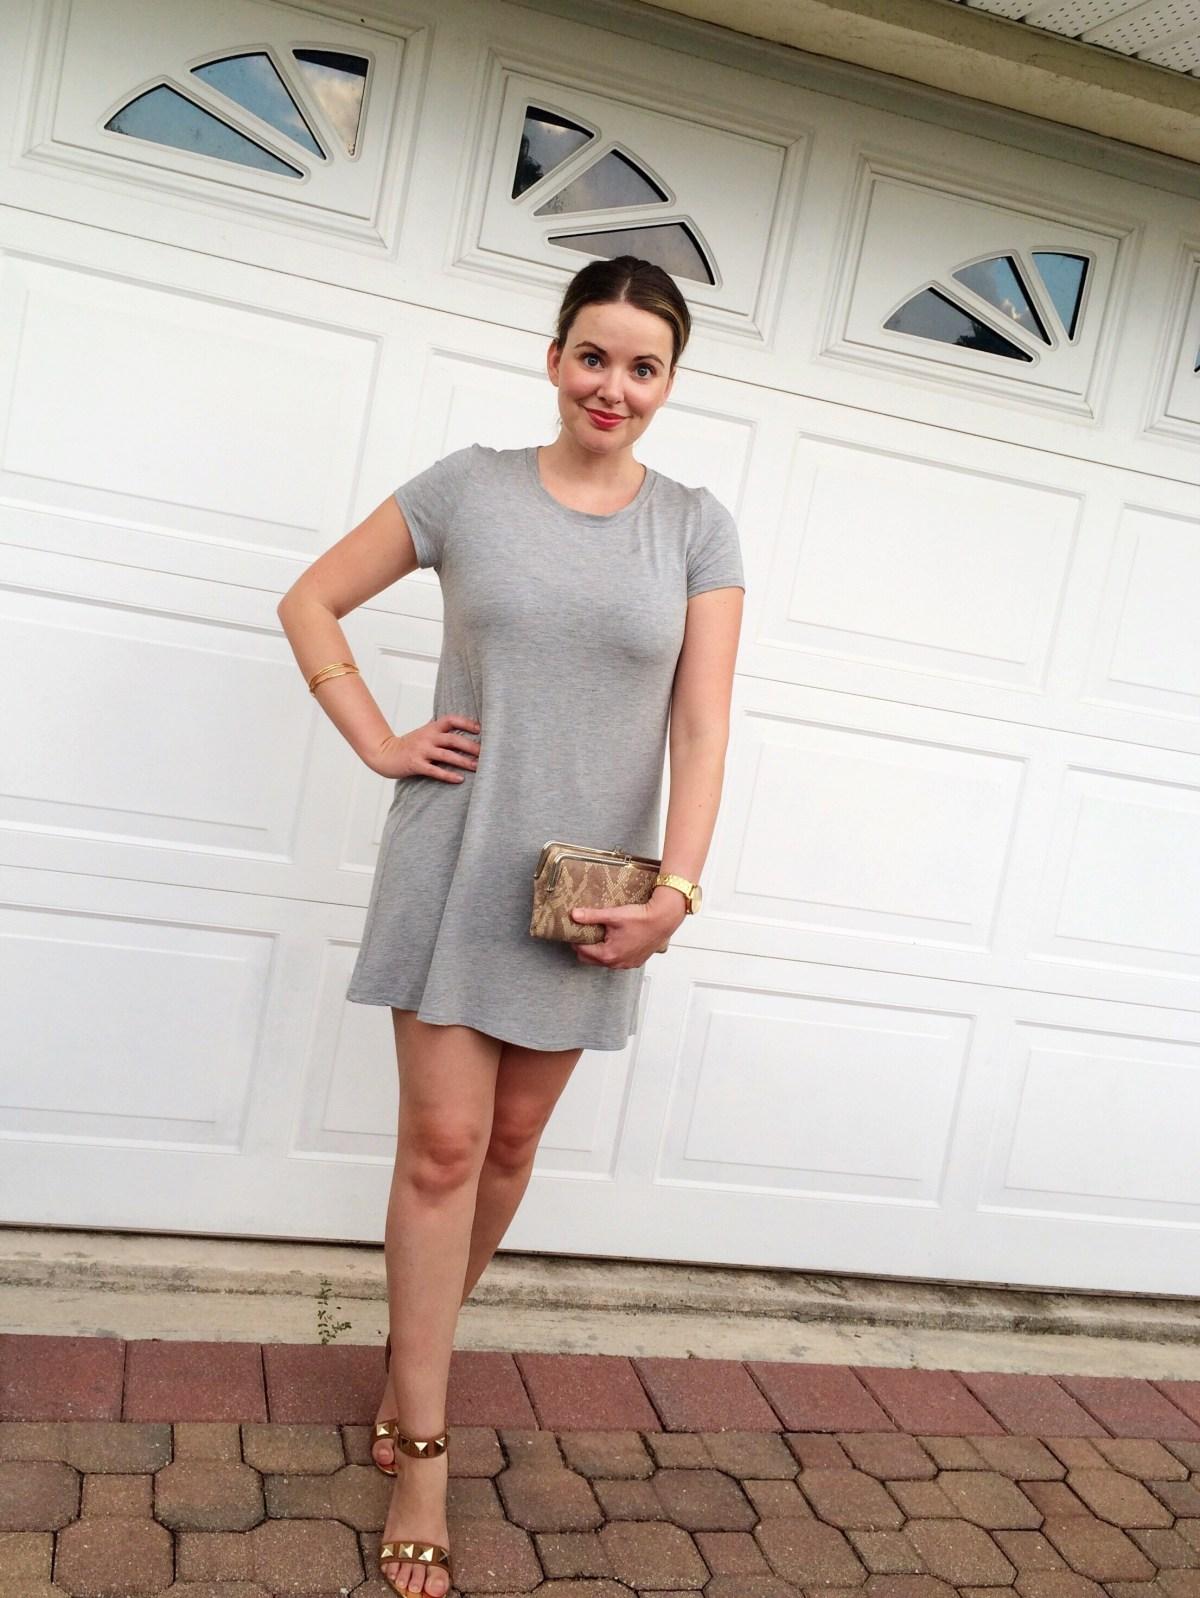 A Pretty Penny, T-Shirt Dress, Casual Style, Summer Outfit Ideas, OOTD, Neutrals, Closet Basics